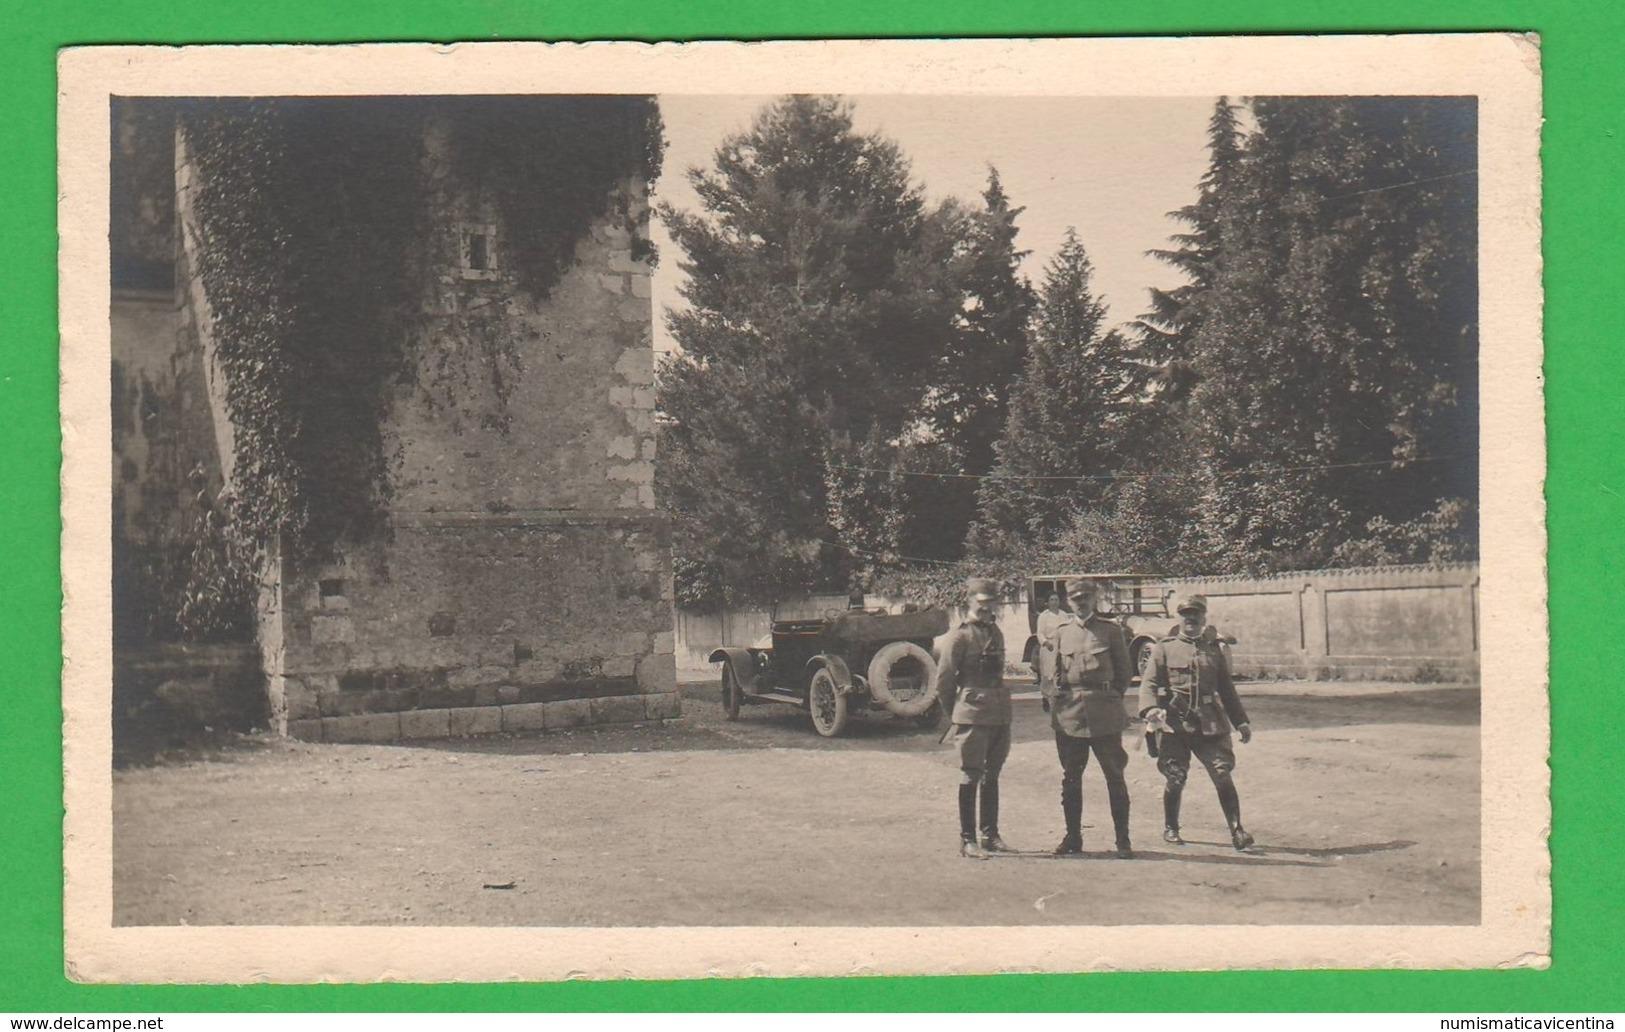 Militari Artiglieria Osservatori 1915 1918 Zona Udine Fotocartolina - Guerra, Militari